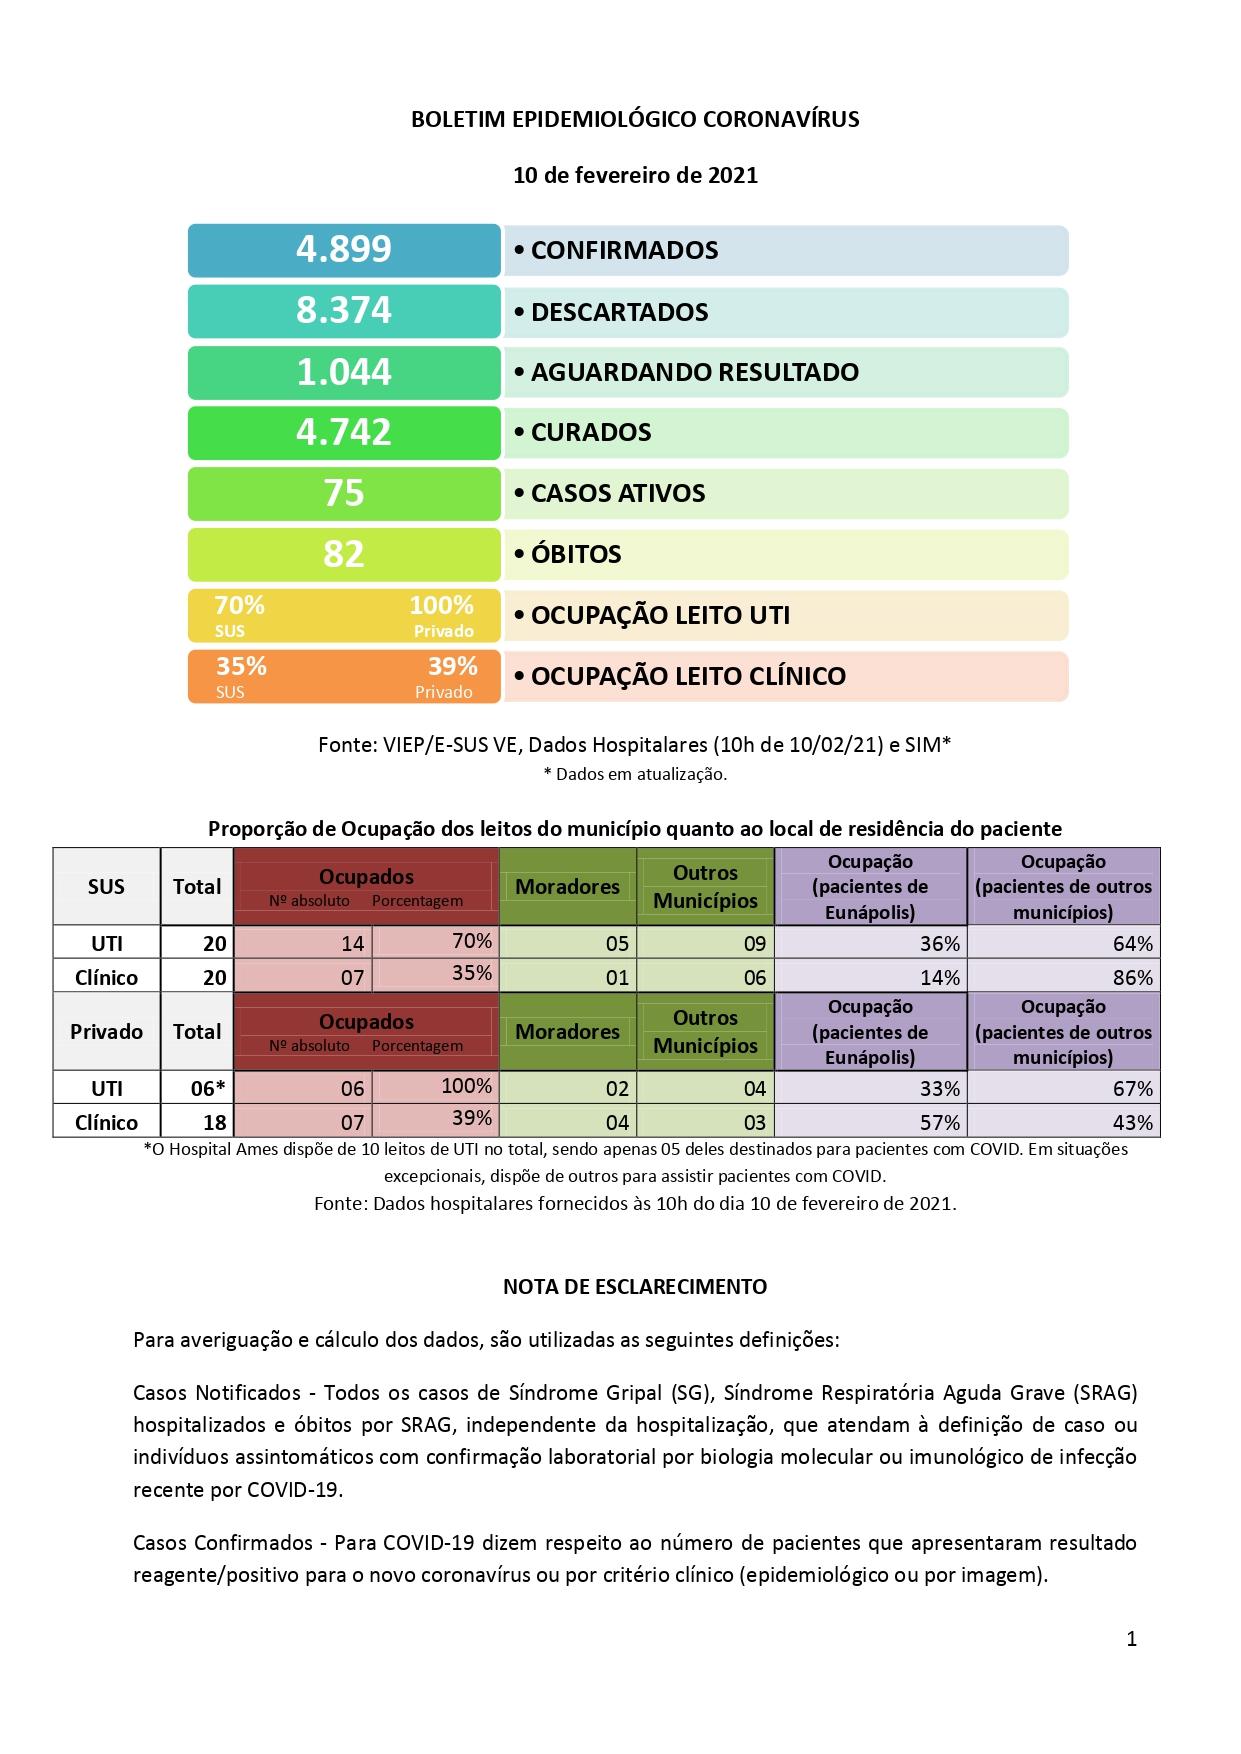 EUNÁPOLIS: Boletim Epidemiológico 10/02 18